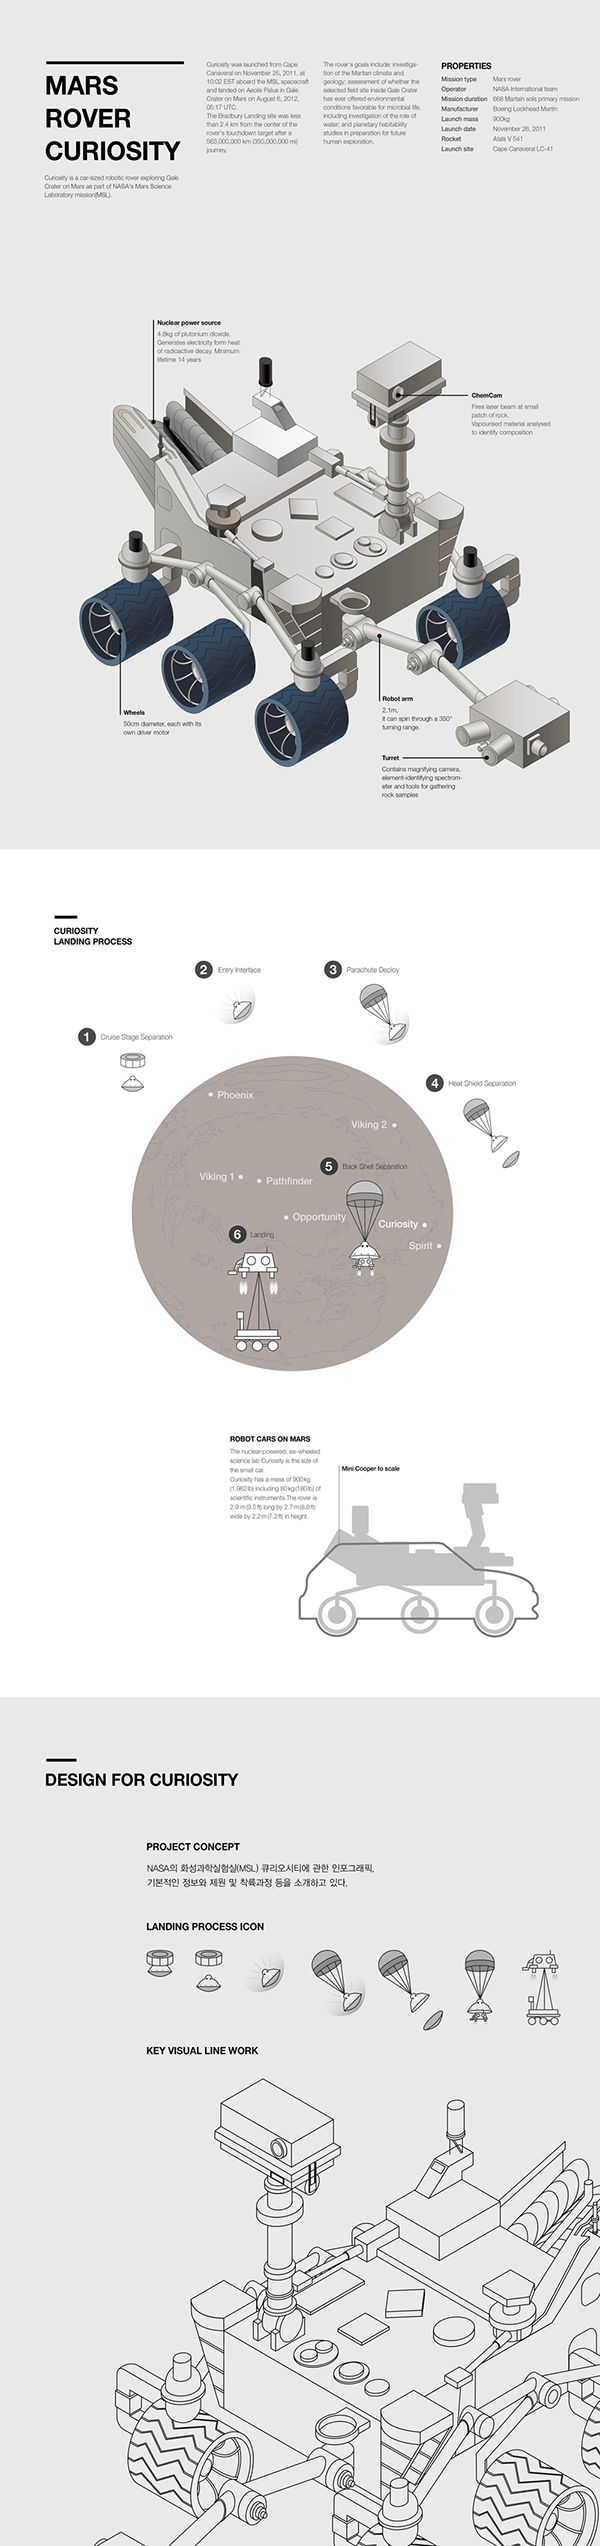 Mars Rover Curiosity Information Design